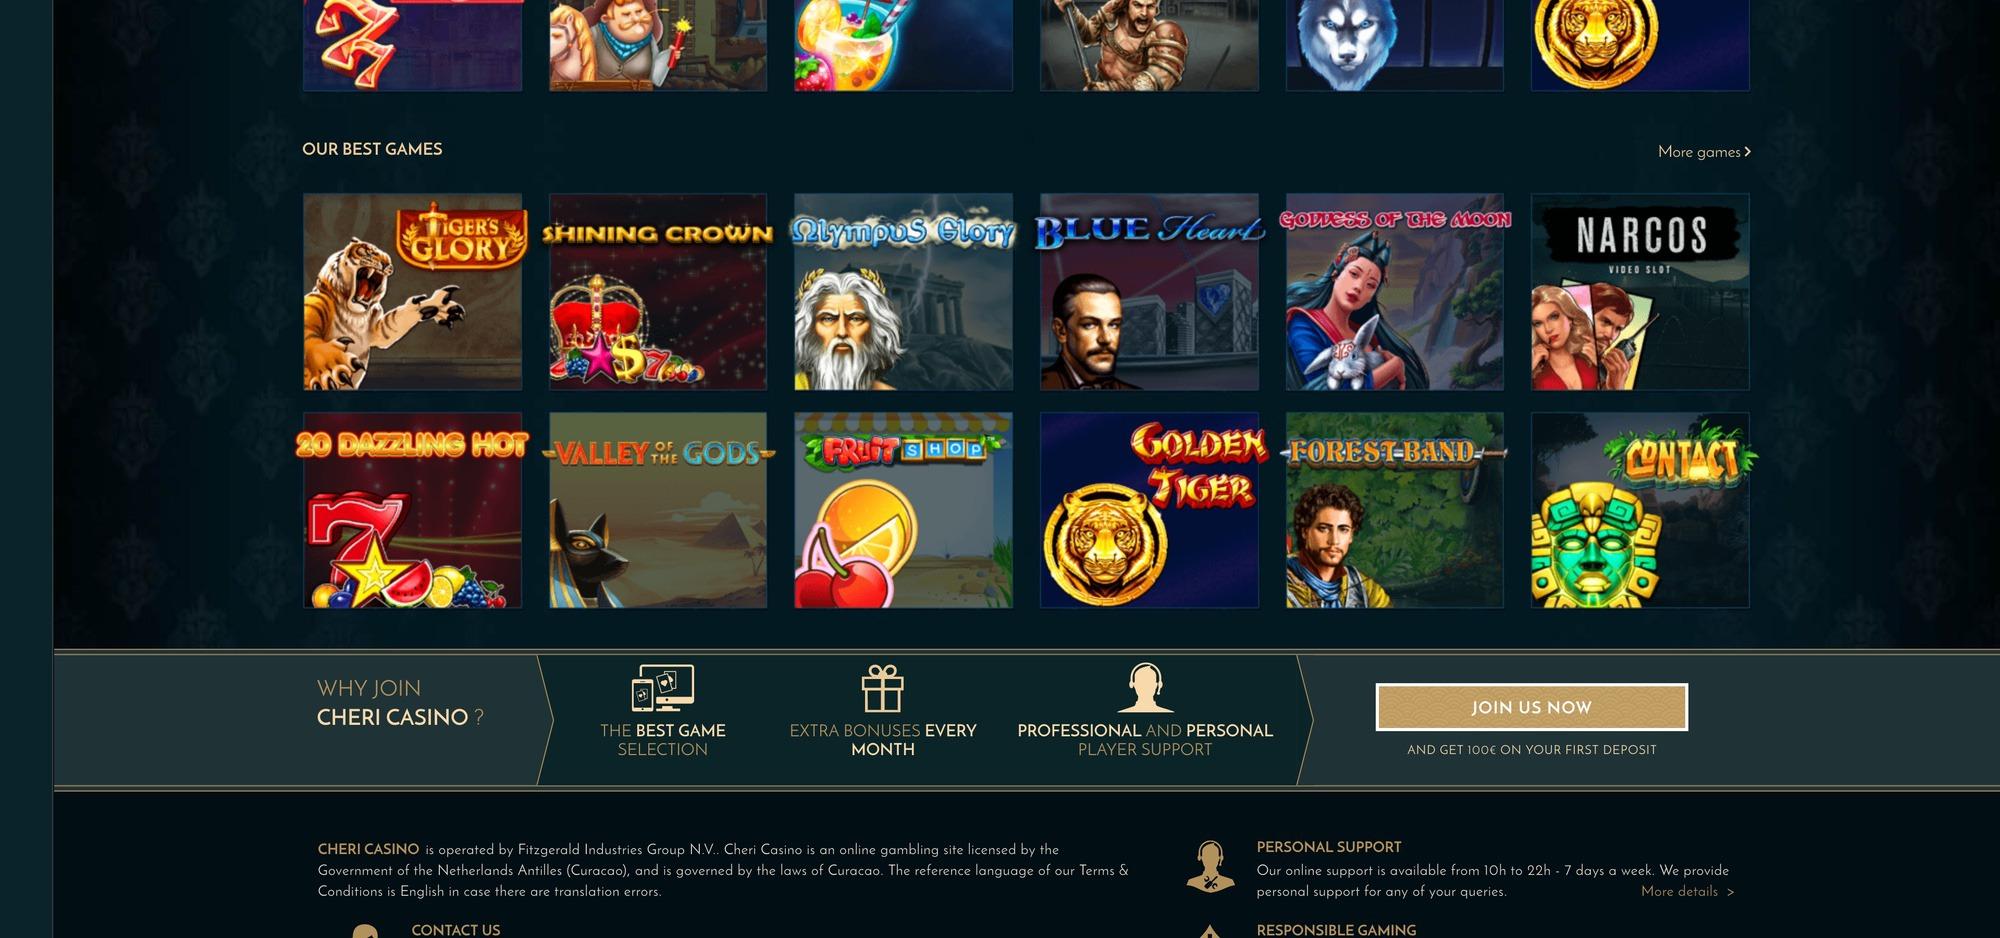 Cheri casino : avis et présentation